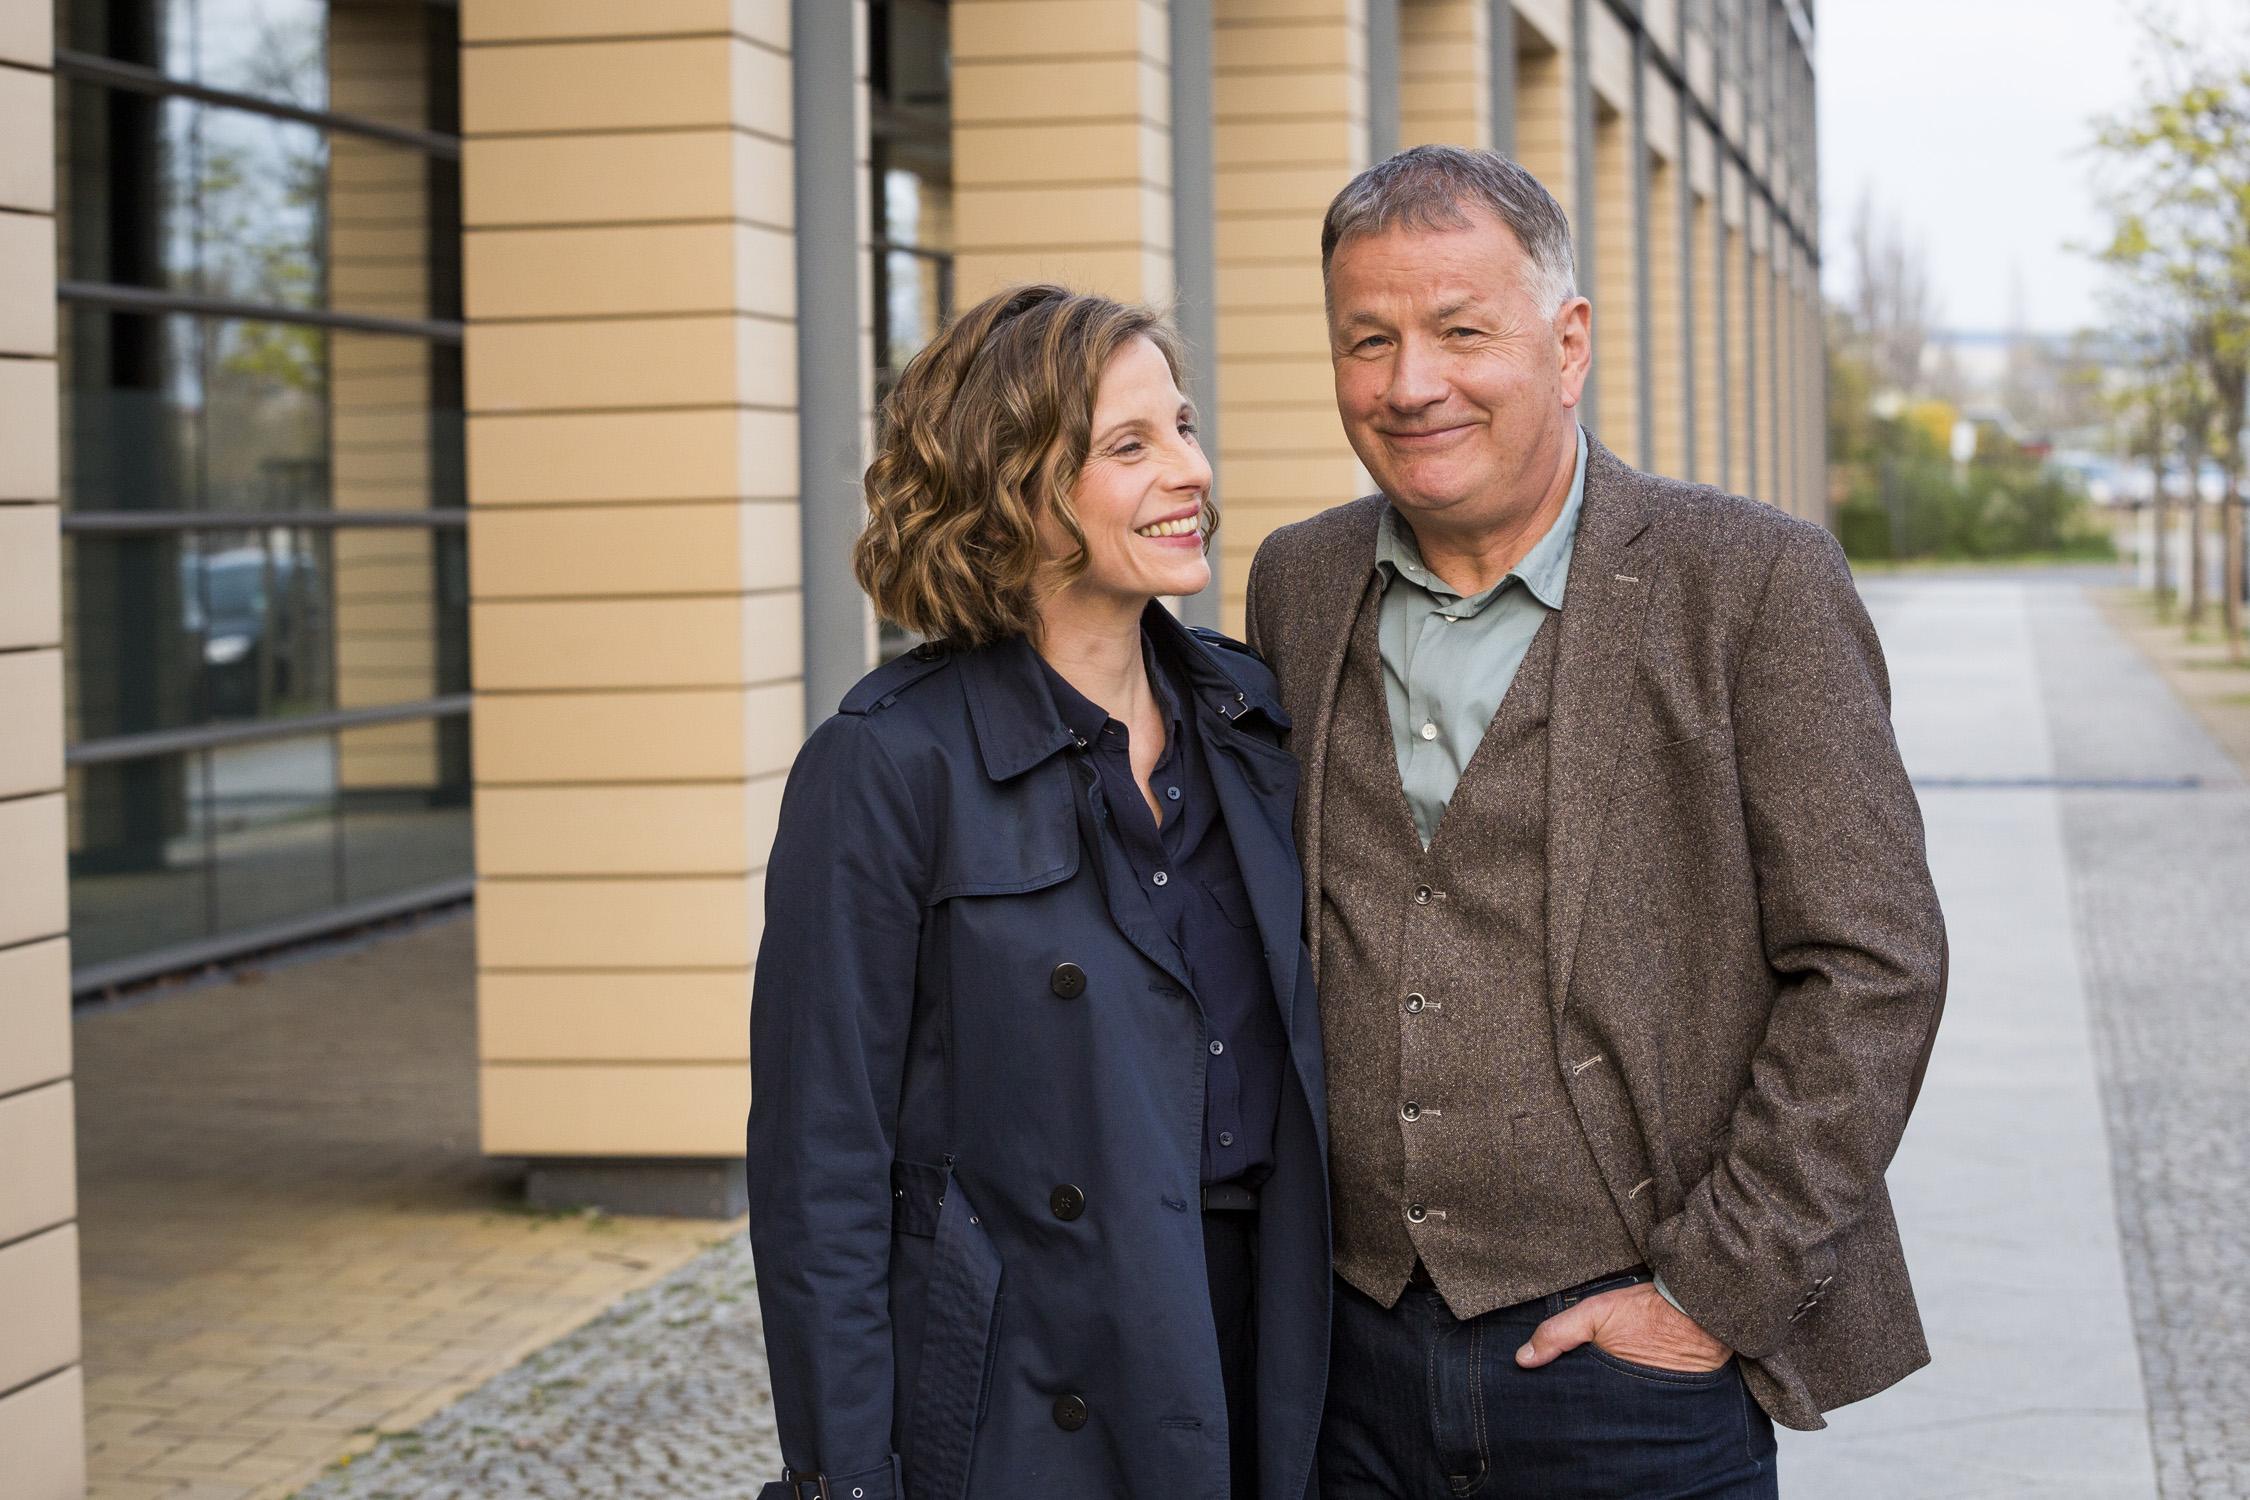 IAF Thomas Rühmann und Julia Jäger Interview